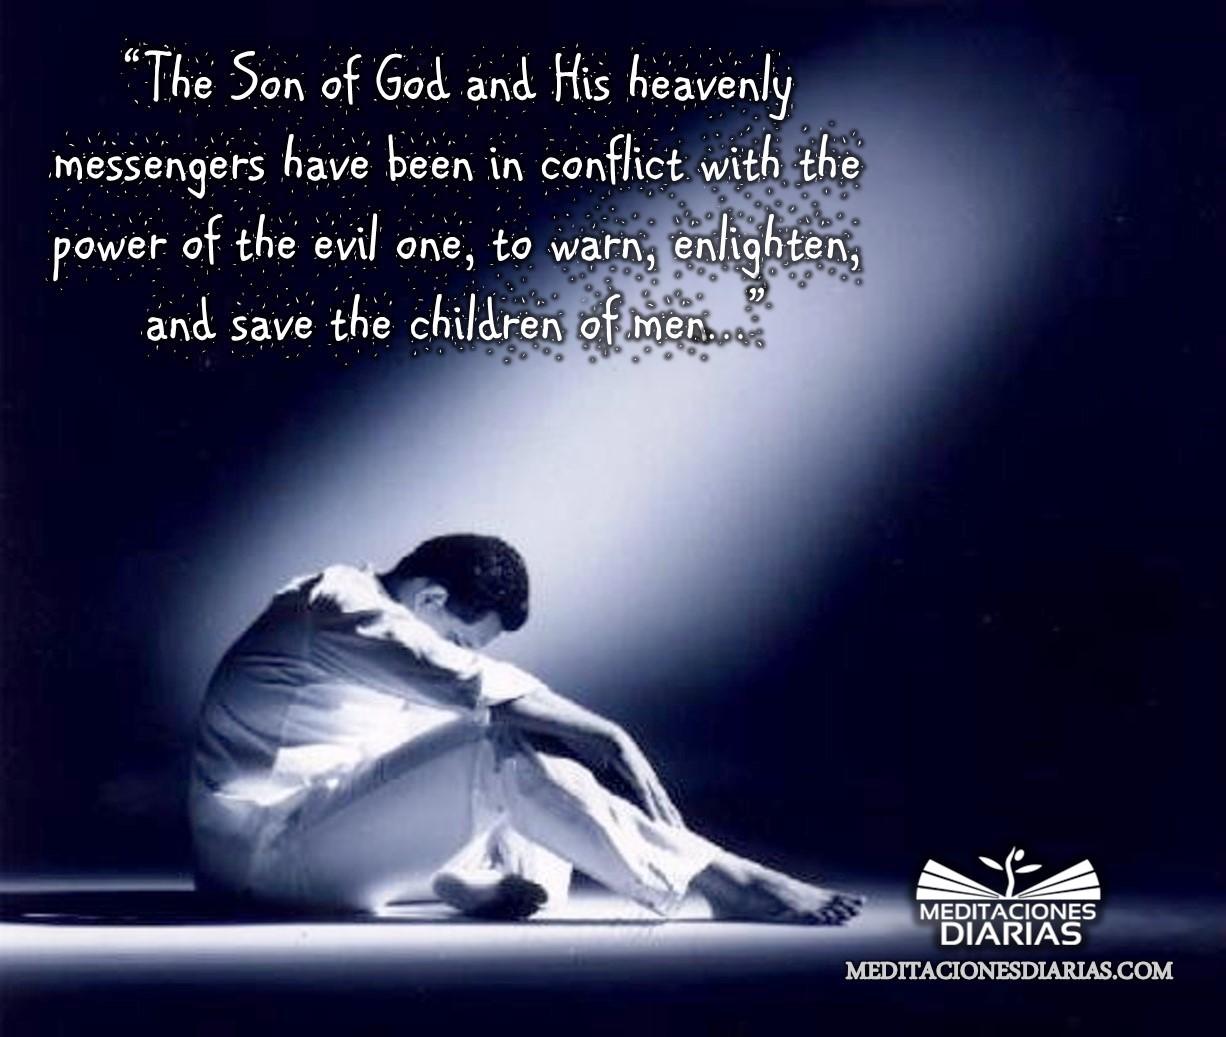 God Intervenes in Armageddon